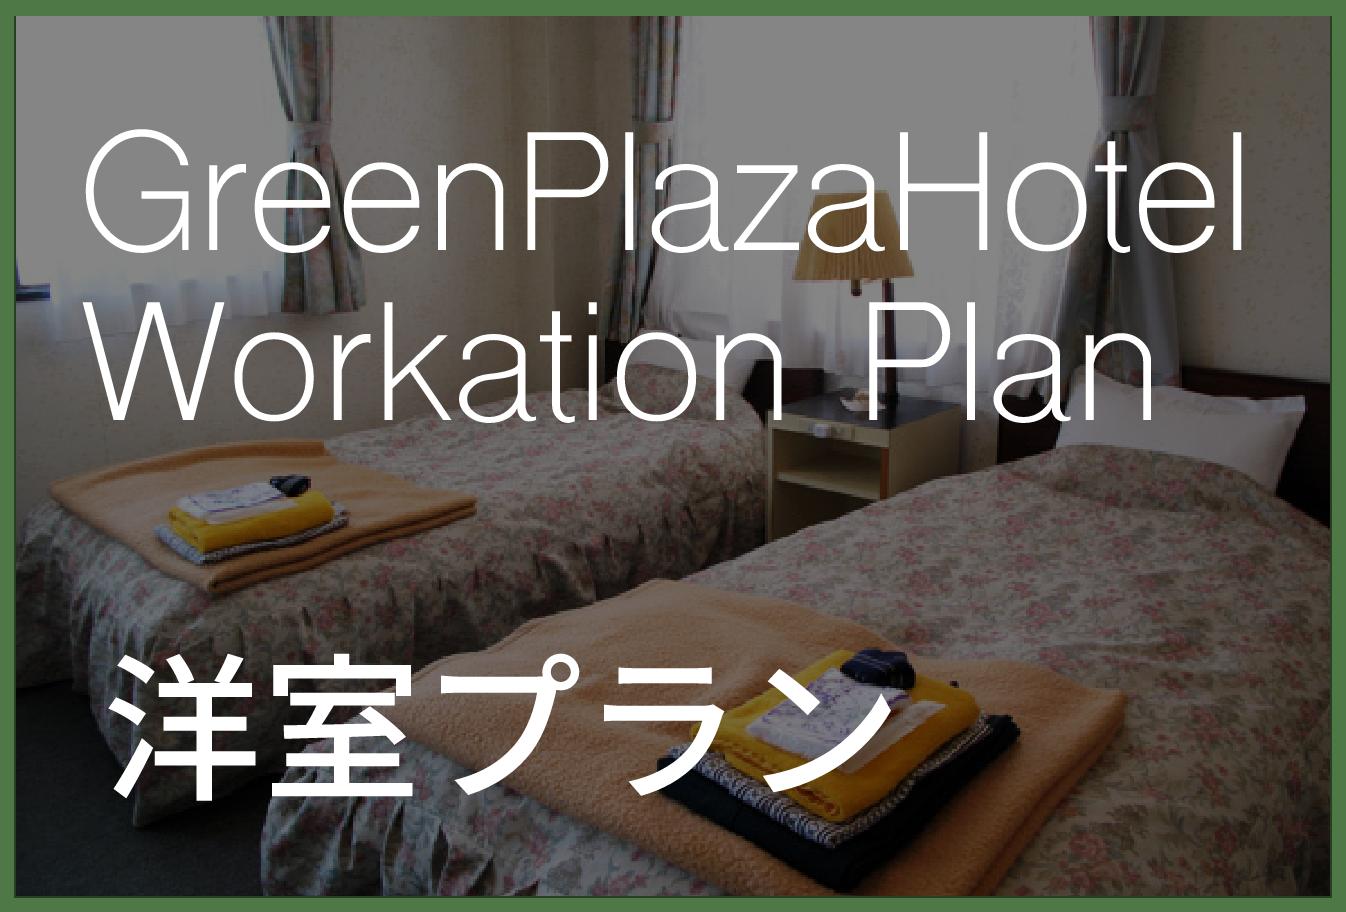 Green Plaza Hotel Workation Pan 洋室プラン